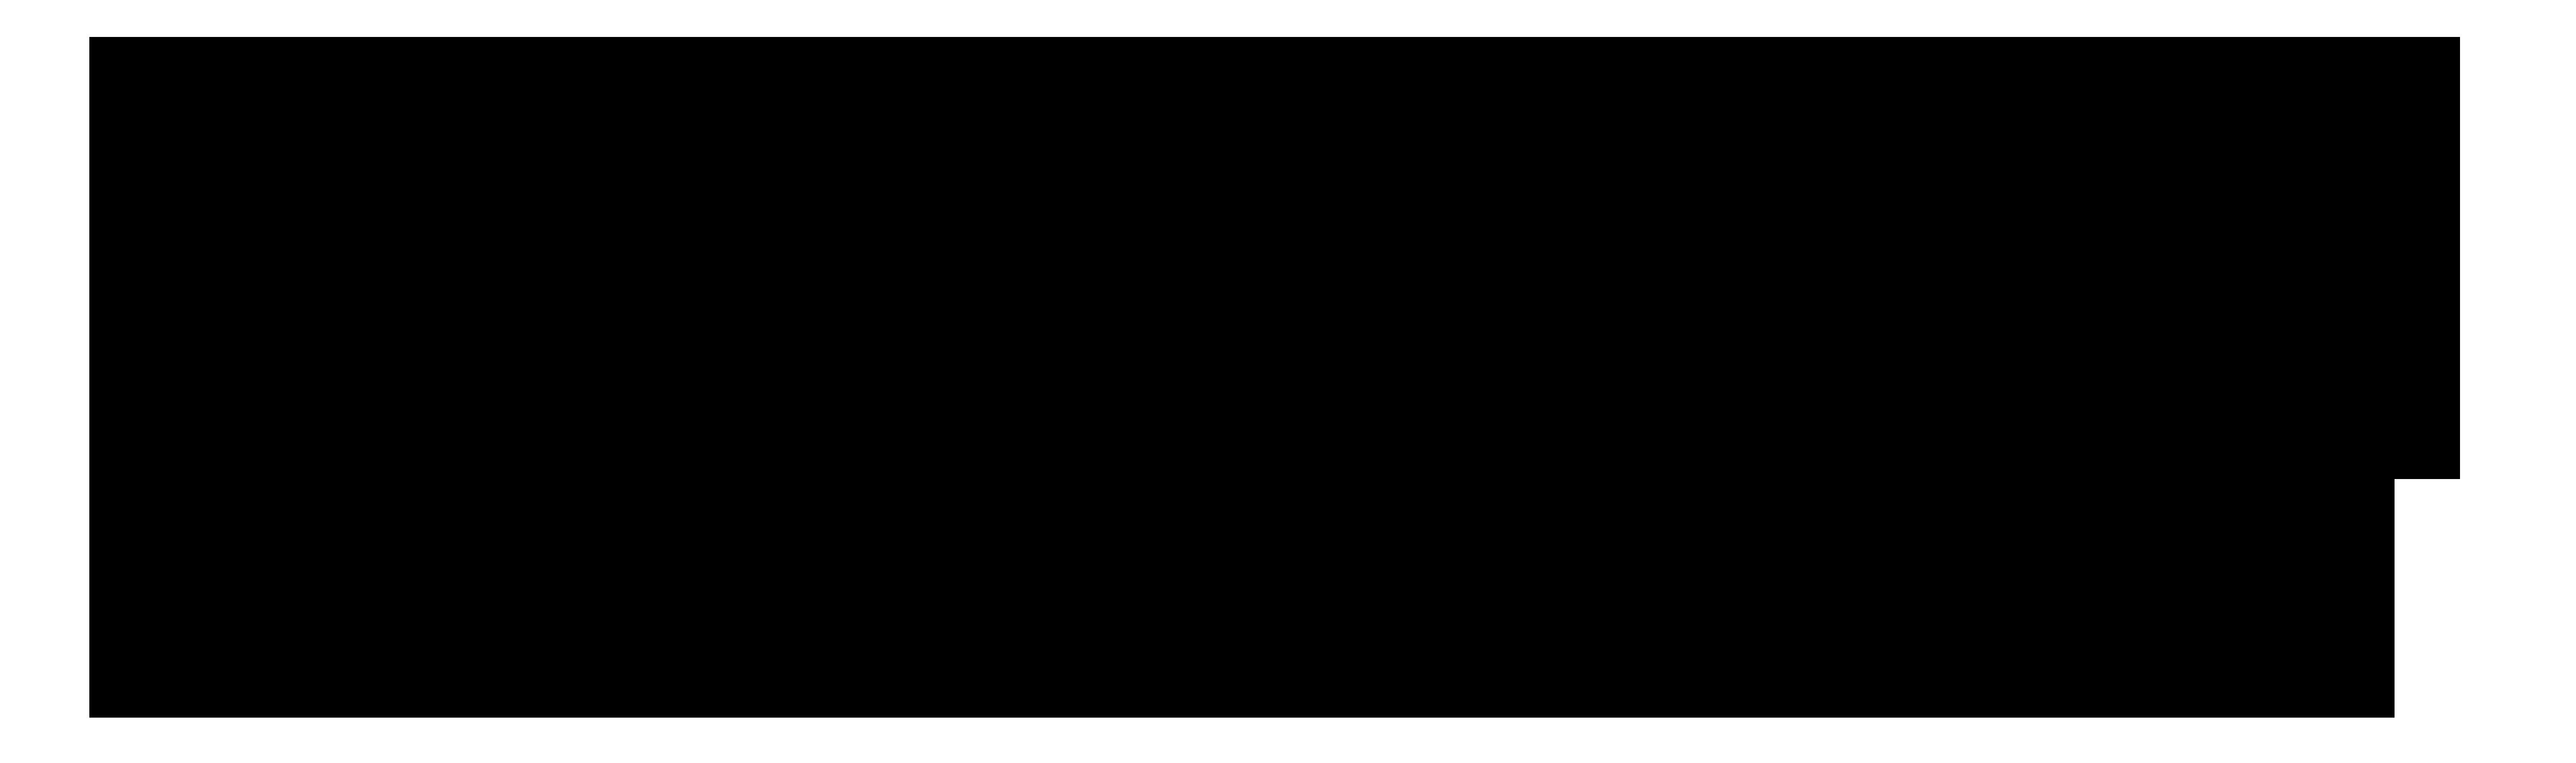 SBS_horizontal_big_black